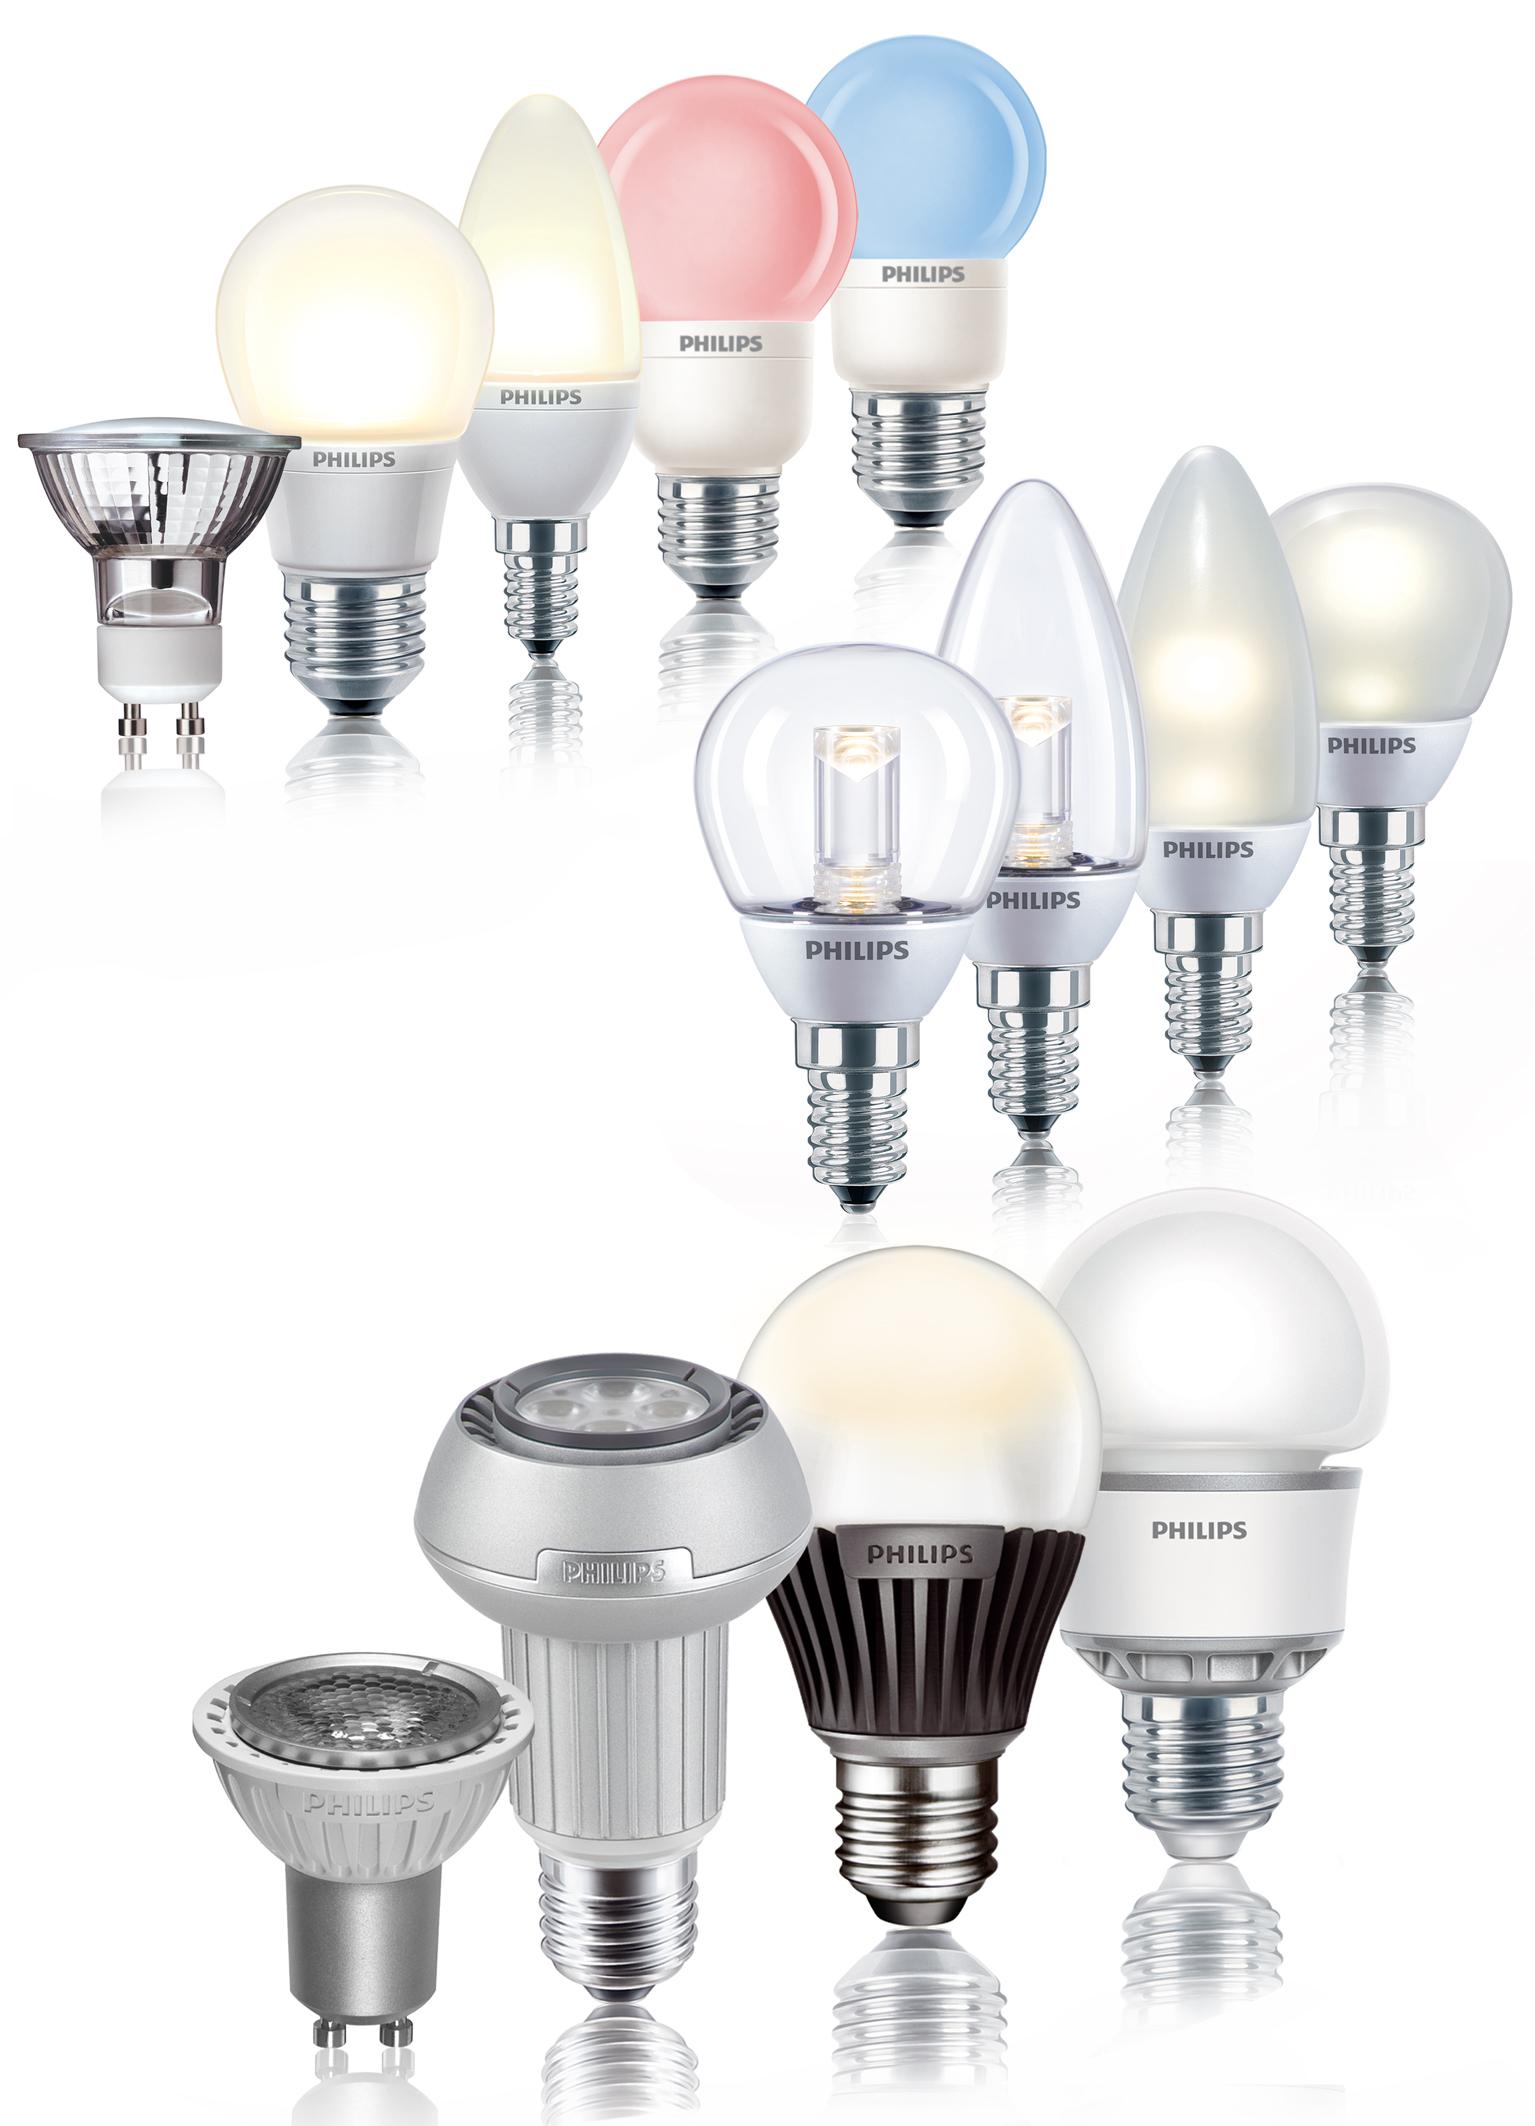 led lampen, led verlichting